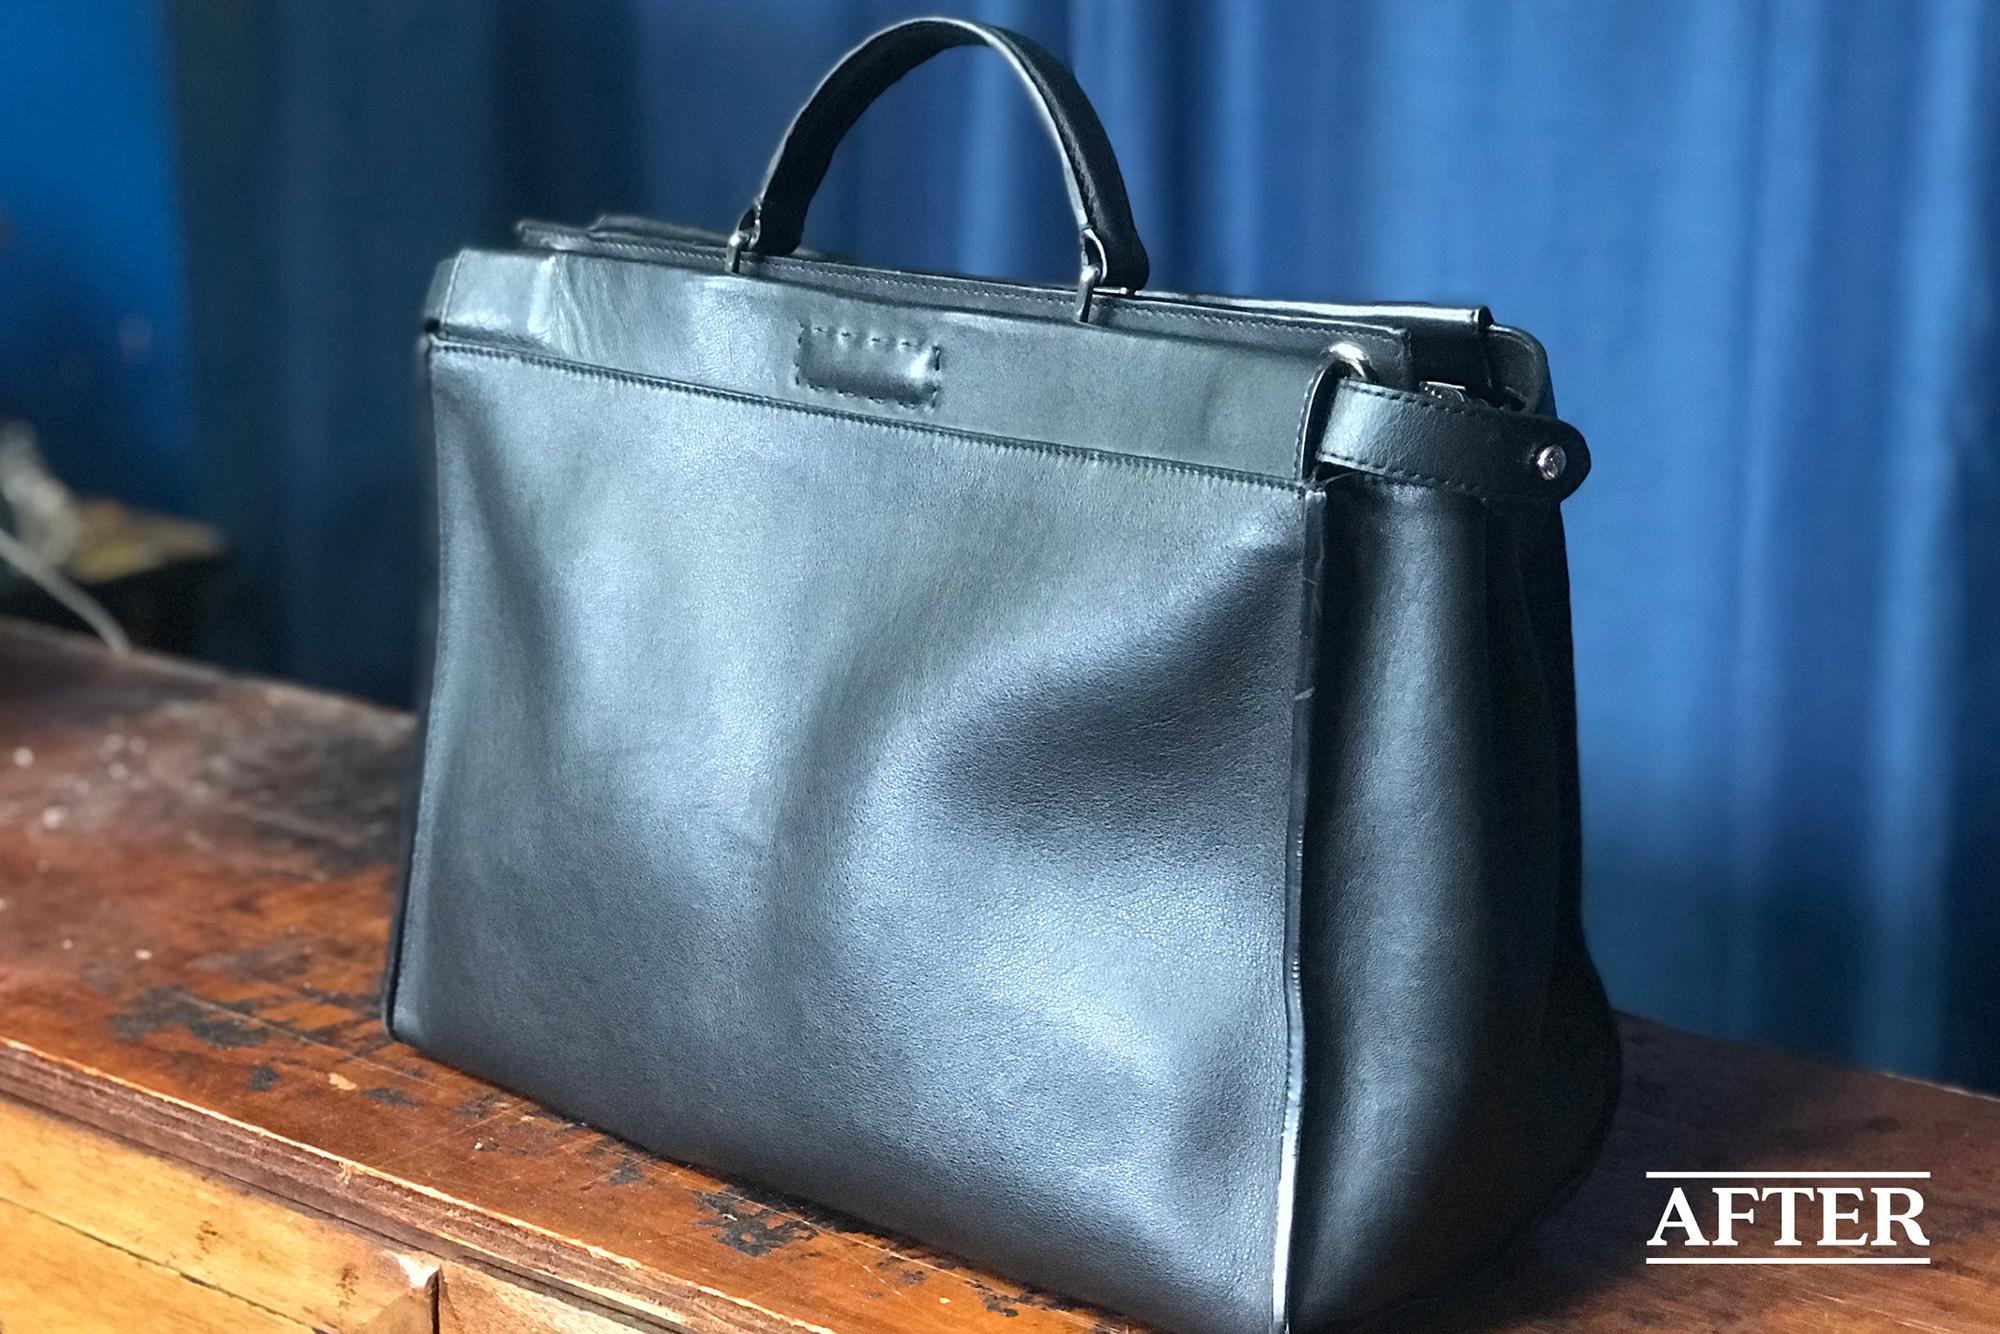 Fendi-handbag-repair